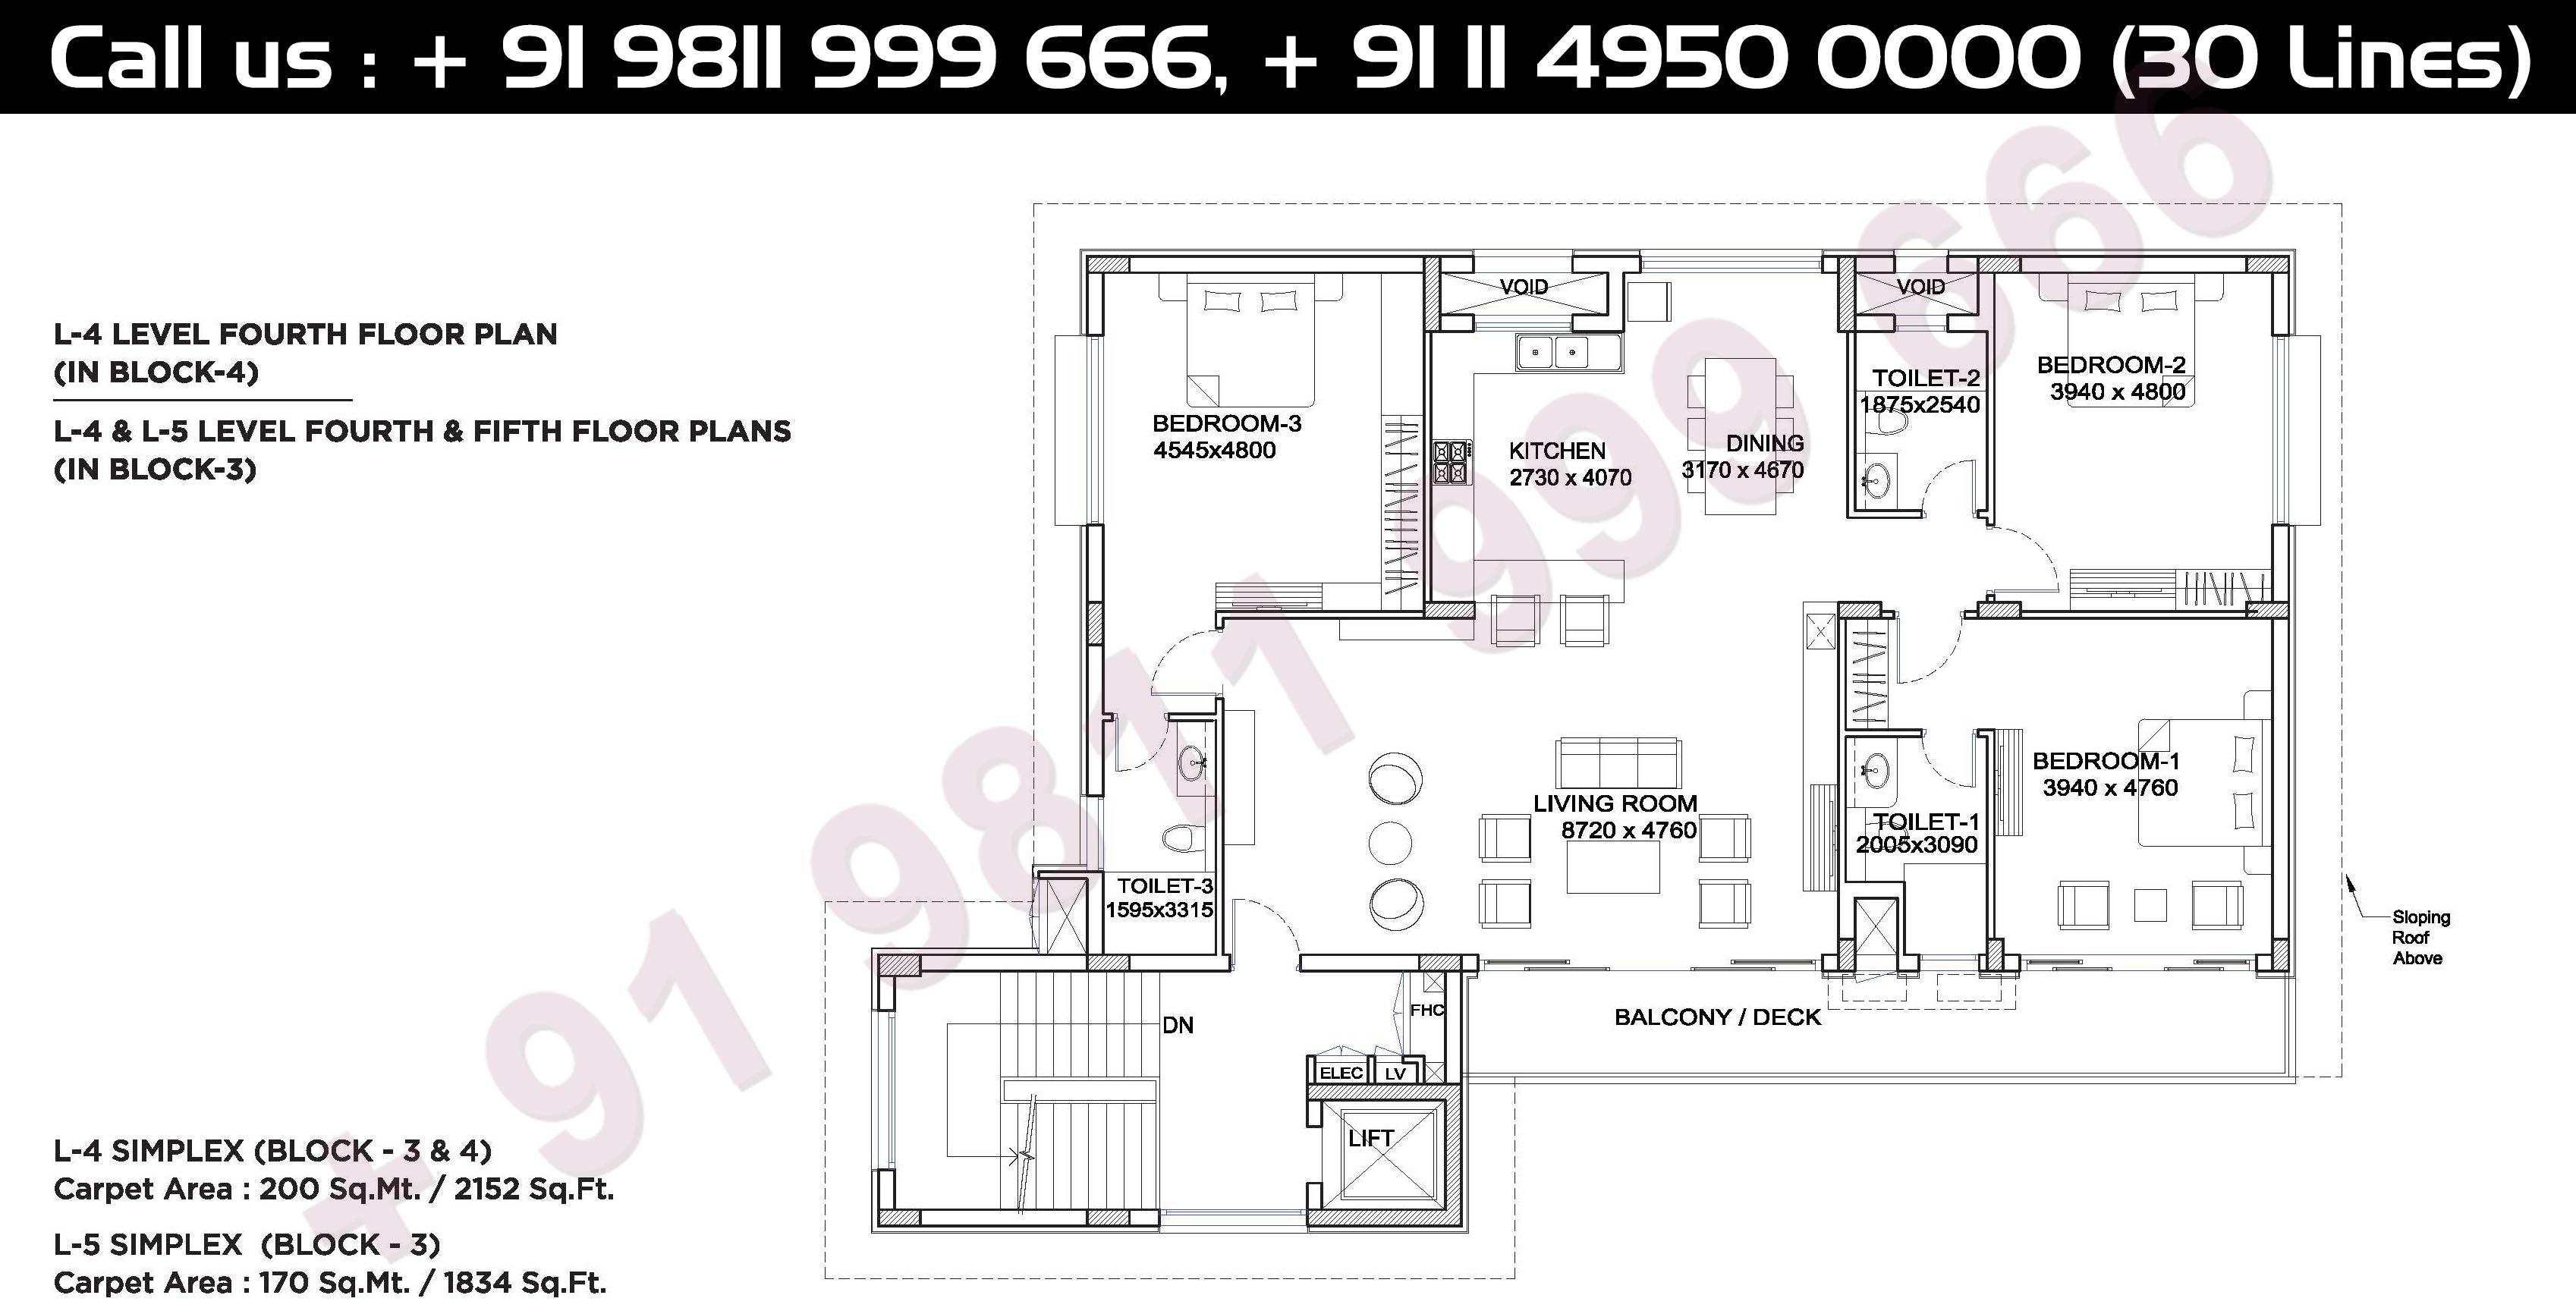 4th & 5th Floor Plan, Block - 3 & 4, Carpet Area, 200 Sqmt: 2152 Sq. Ft